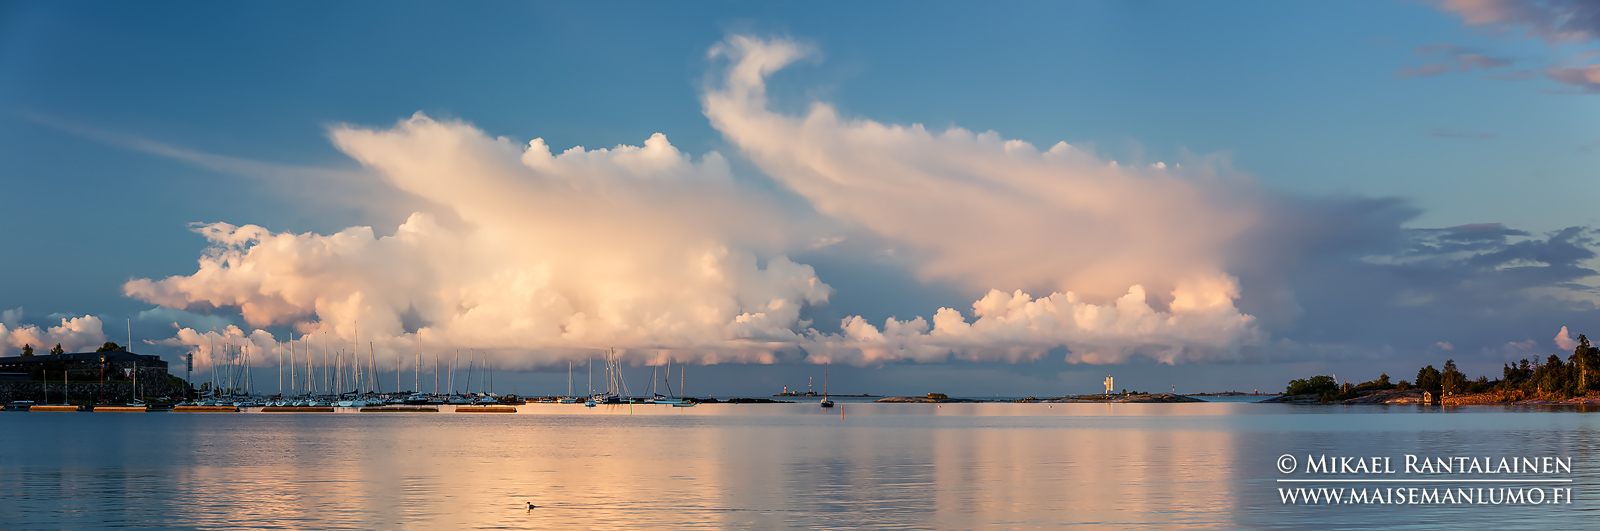 Auringonnousun värjäämät pilvet Särkän ja Harakan välissä, Helsinki (HP152)